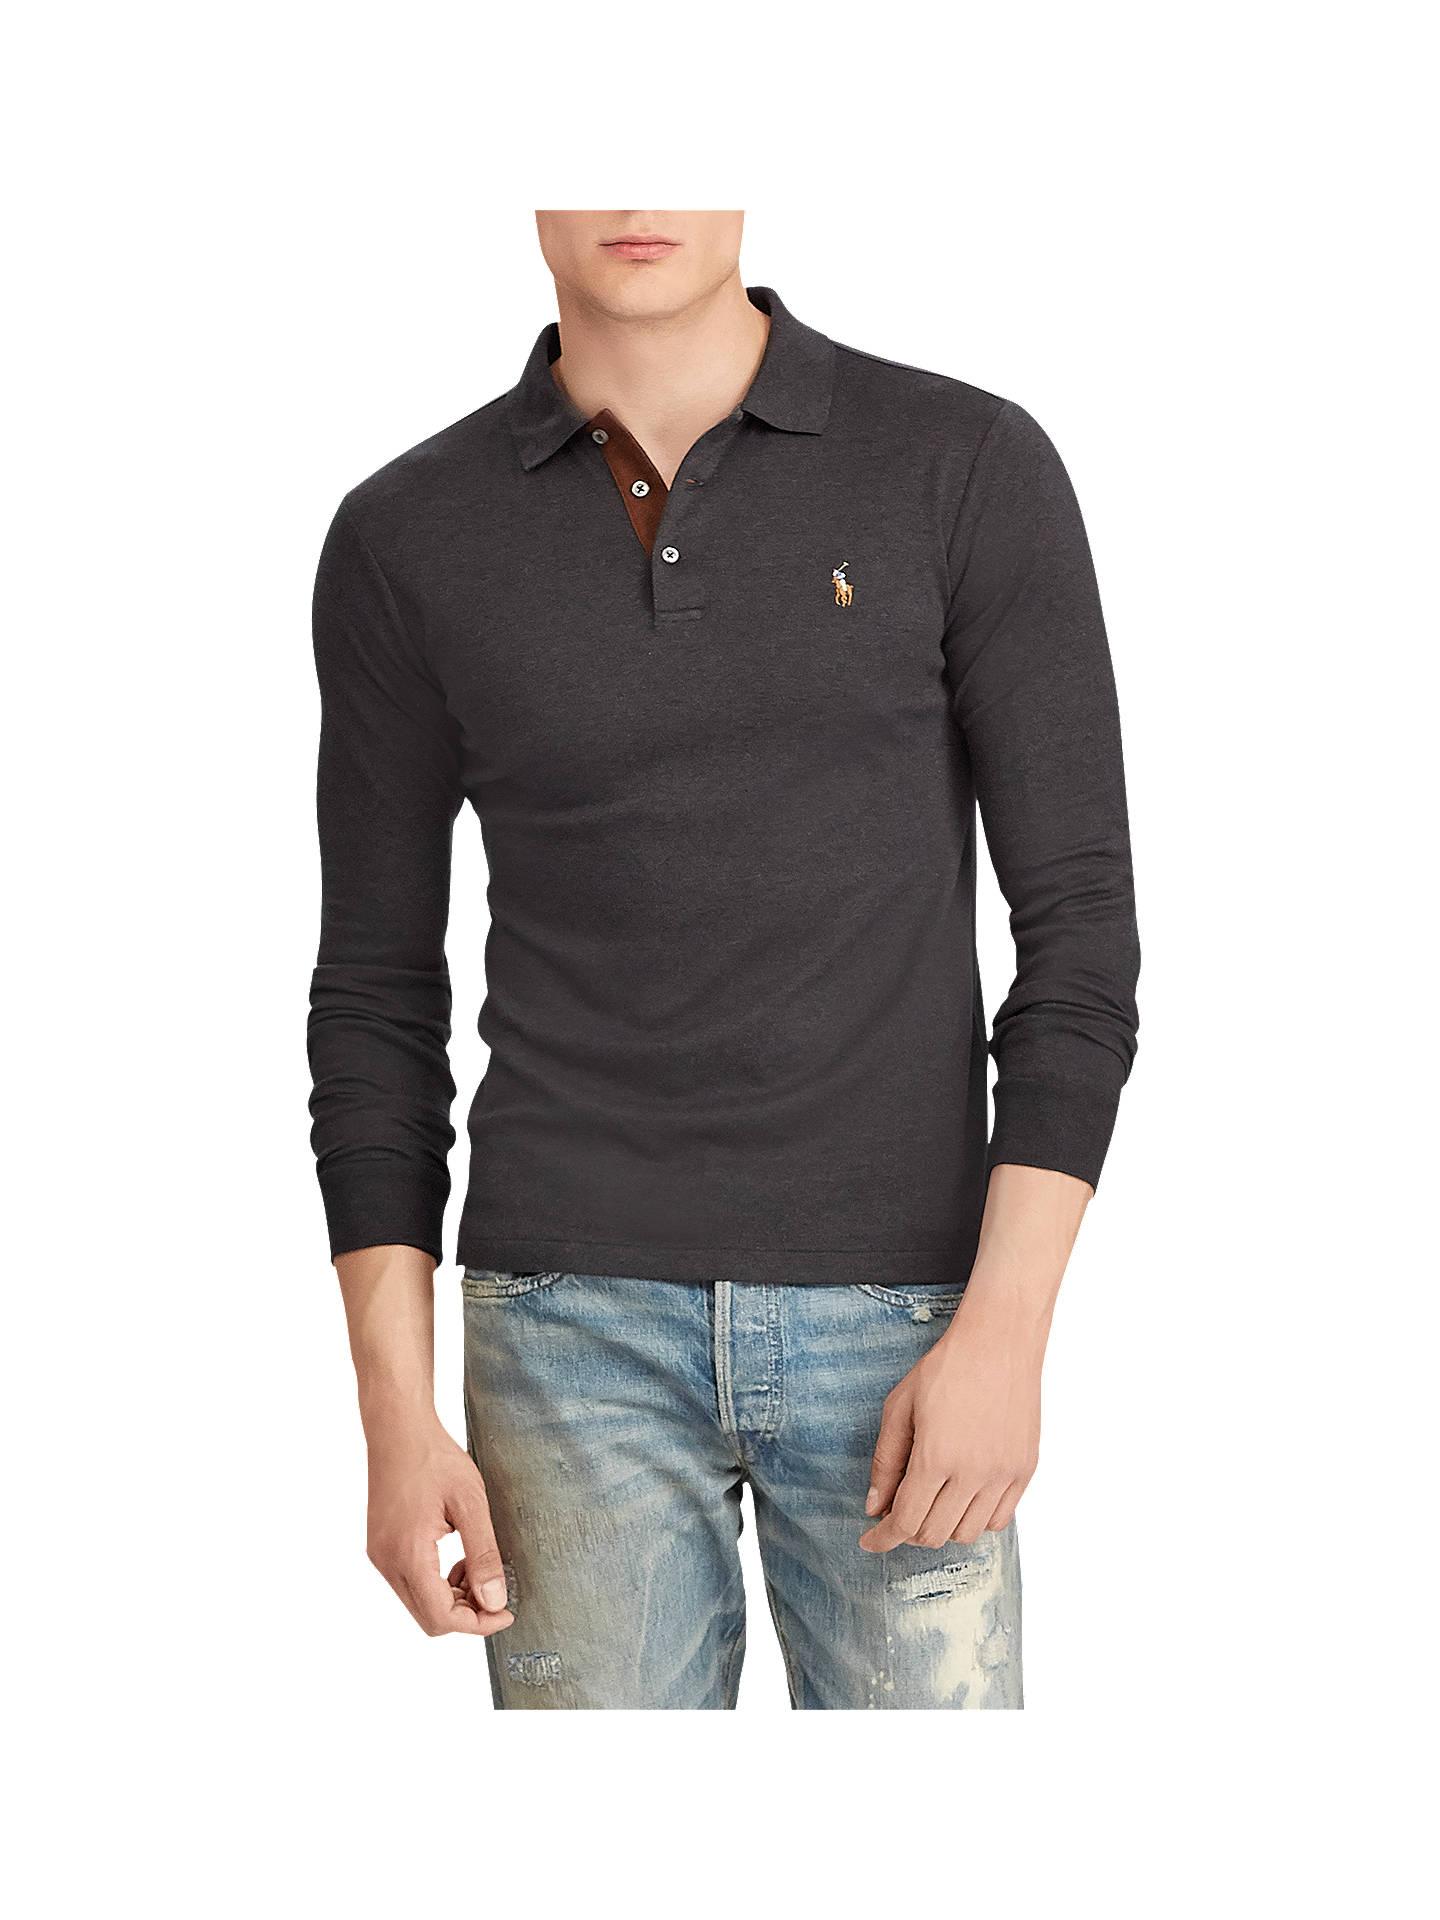 b8cc200d6874 Polo Ralph Lauren Long Sleeve Mesh Polo Shirt, Dark Granite Heather ...